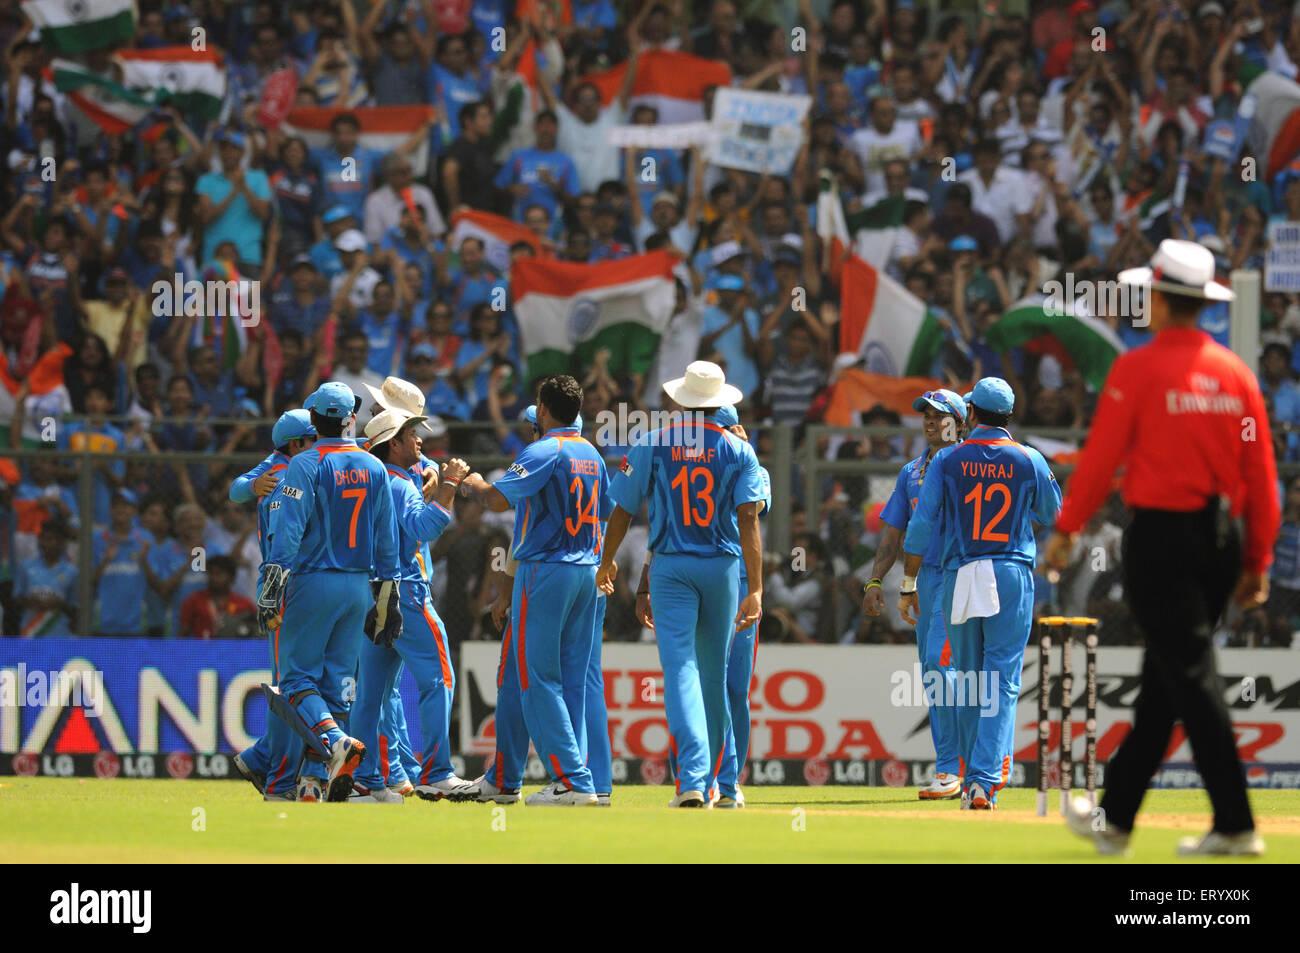 cricket team celebrate wicket Sri Lanka batsman Upul Tharanga ICC Cricket World Cup finals Wankhede stadium Mumbai - Stock Image